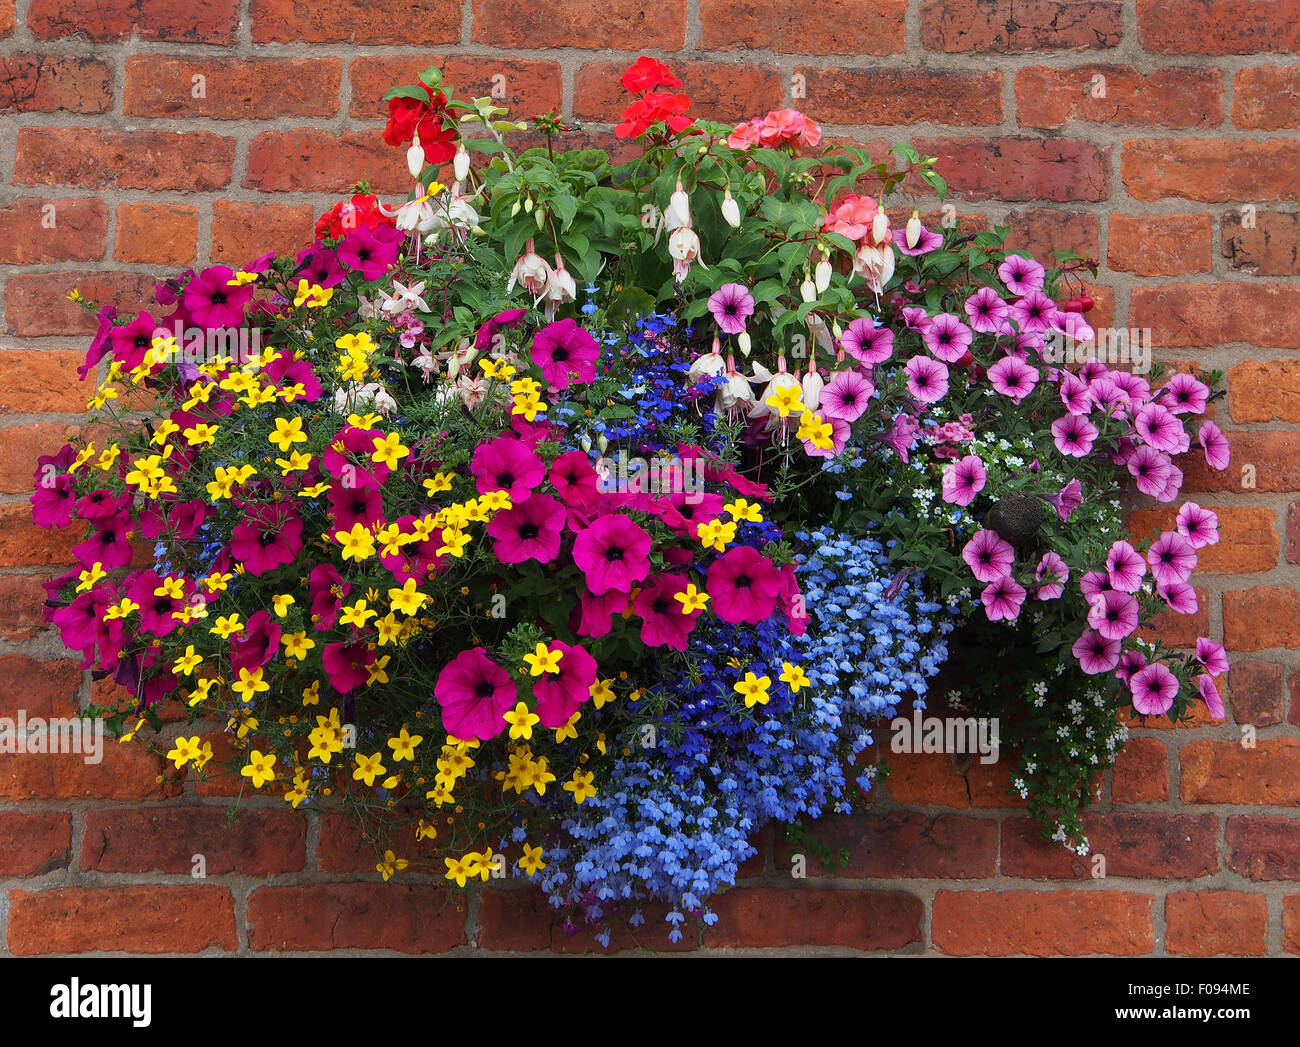 Hanging basket against a brick wall, containing bidens, geraniums, fuschia, lobelia and petunias taken in August - Stock Image